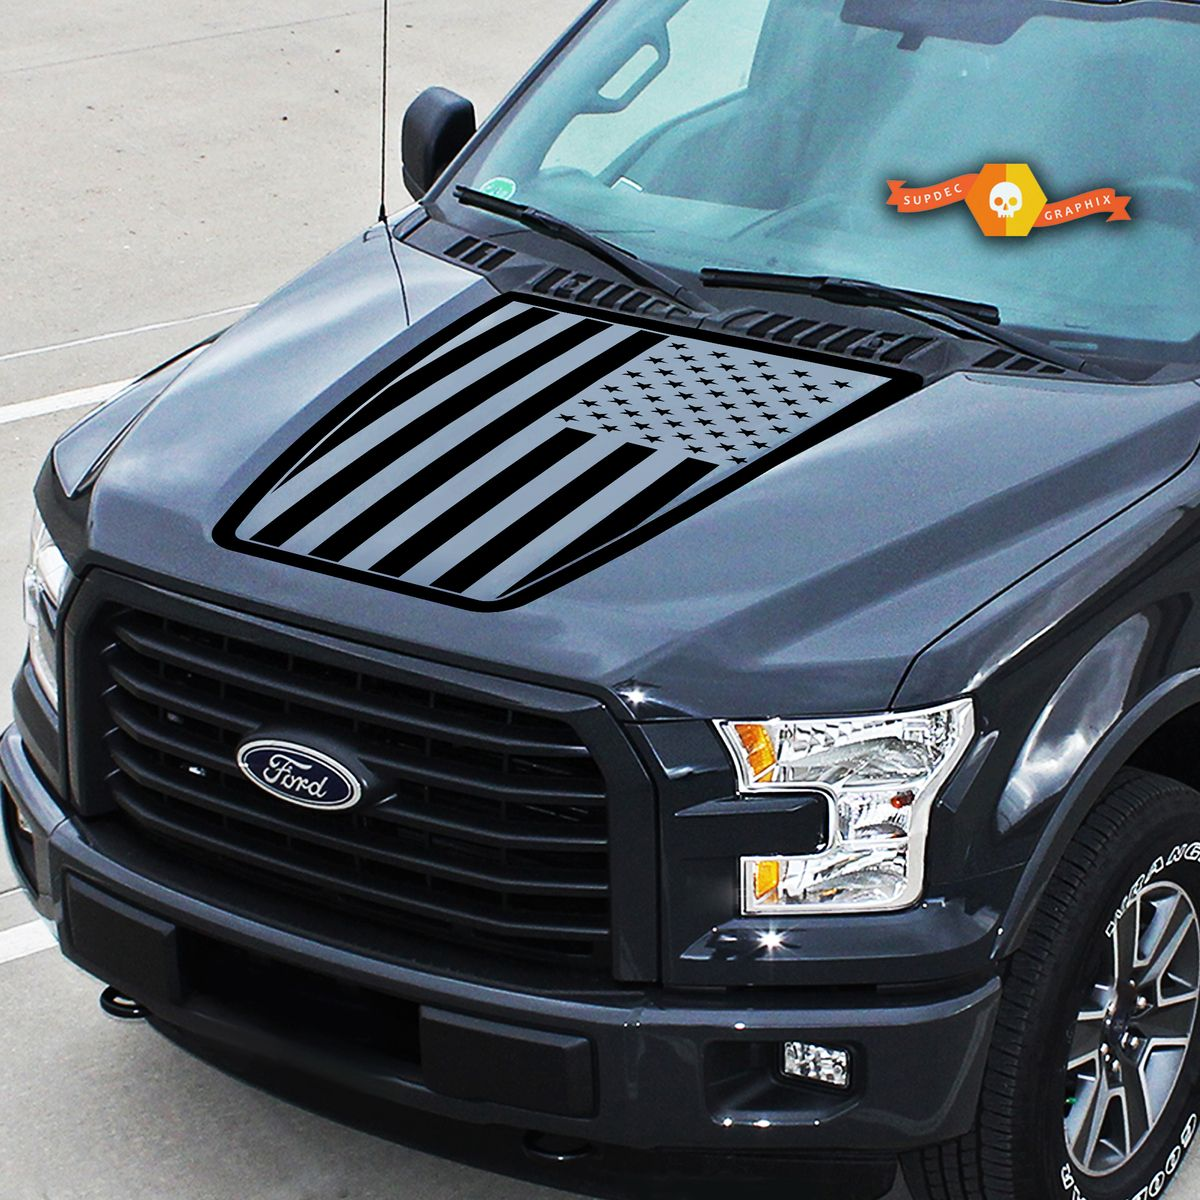 Hood Ford F 150 Usa Flag Center Graphics Vinyl Decals Truck Stickers 2015 2020 In 2020 Truck Stickers Ford F150 Vinyl Decals